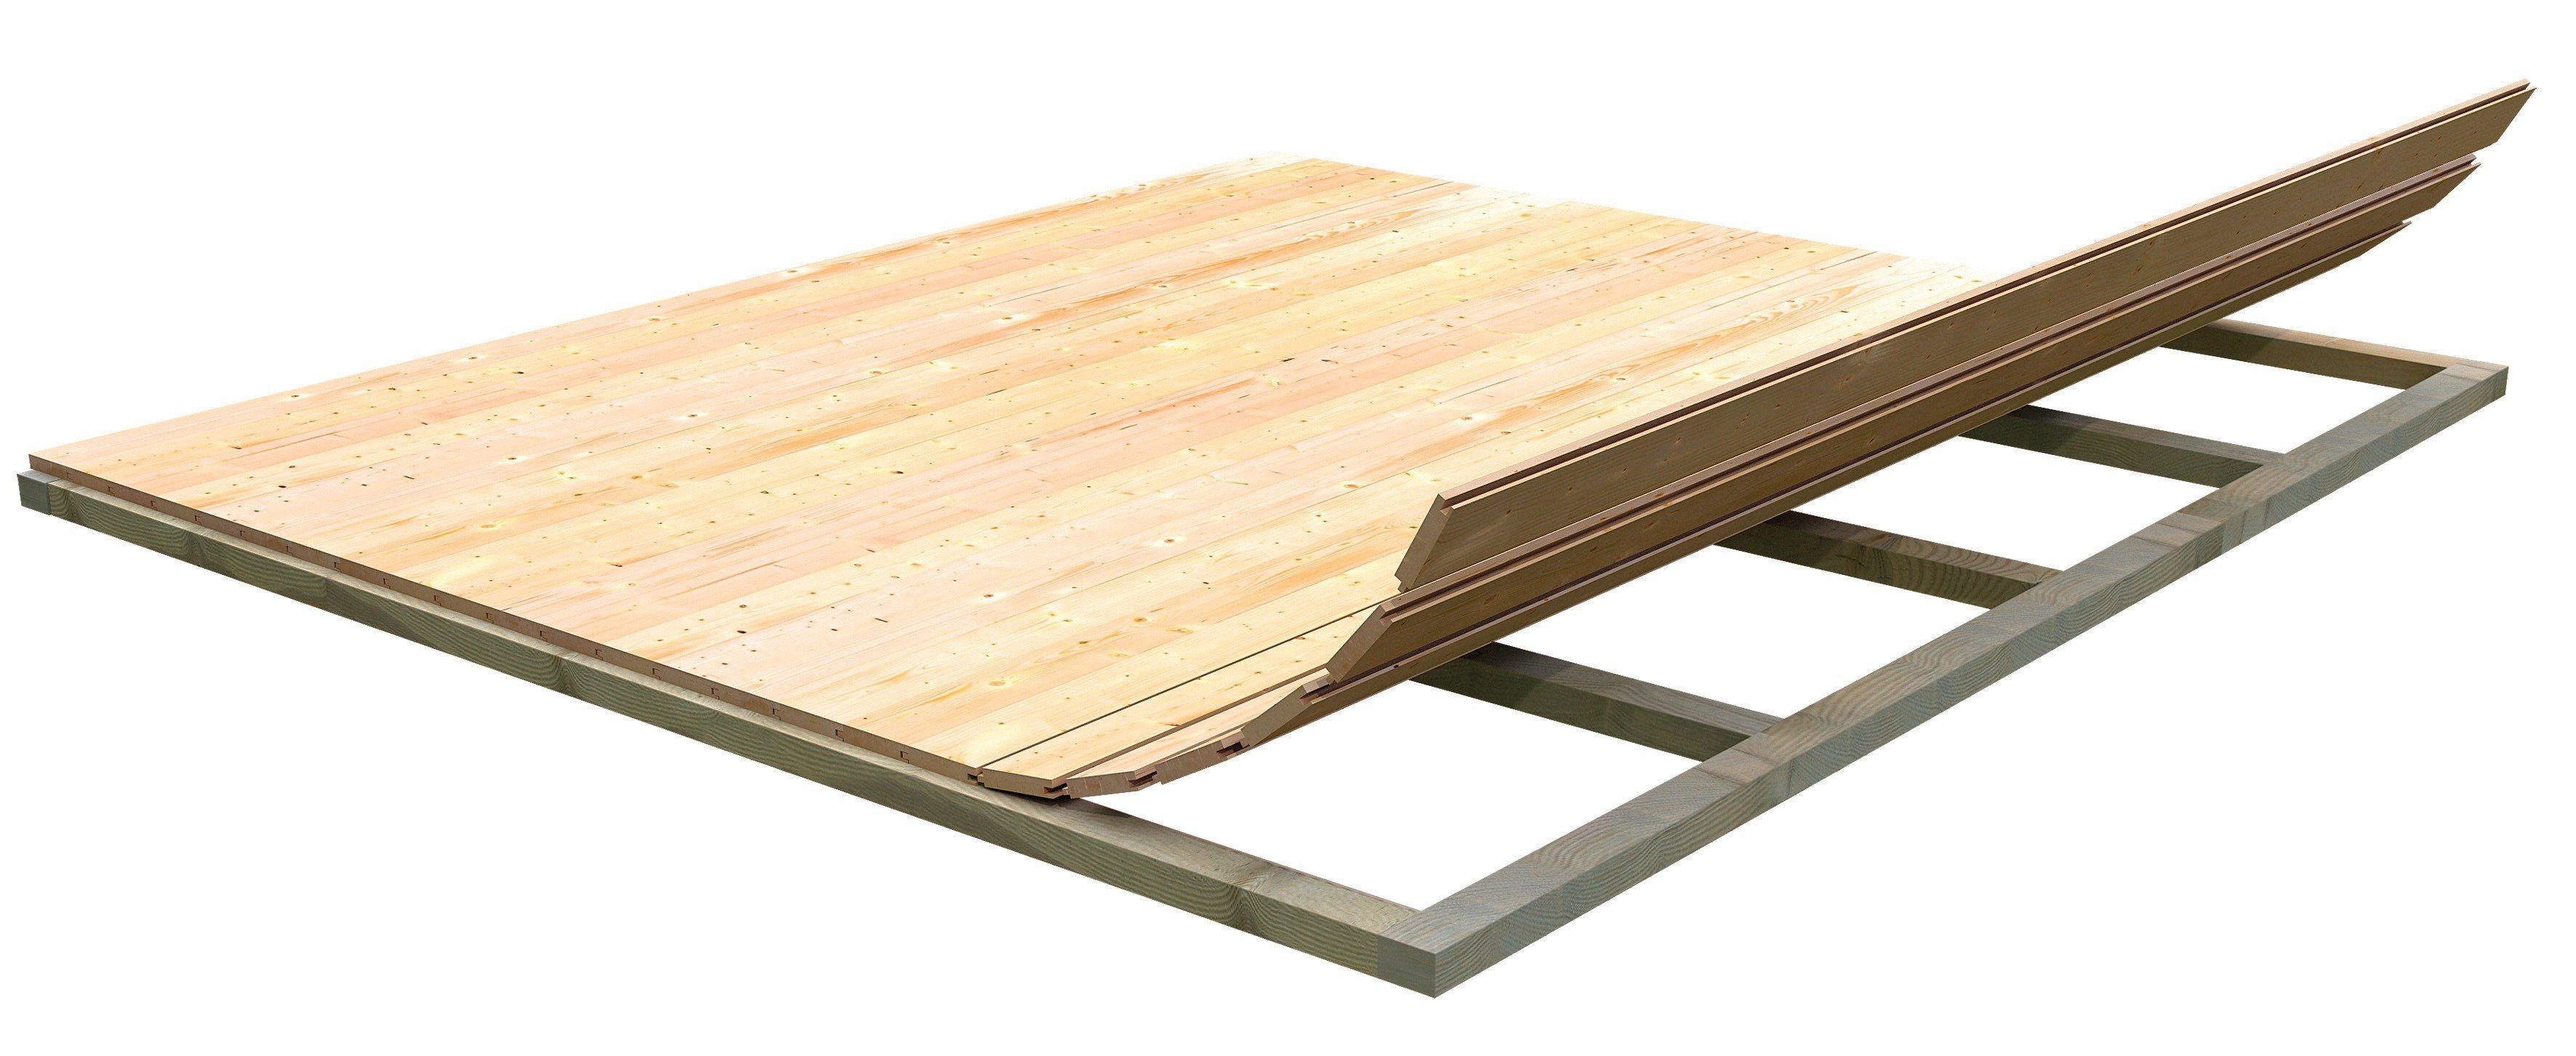 KARIBU Fußboden für Gartenhäuser , BxT: 230x230 cm | Garten > Gartenhäuser | Karibu